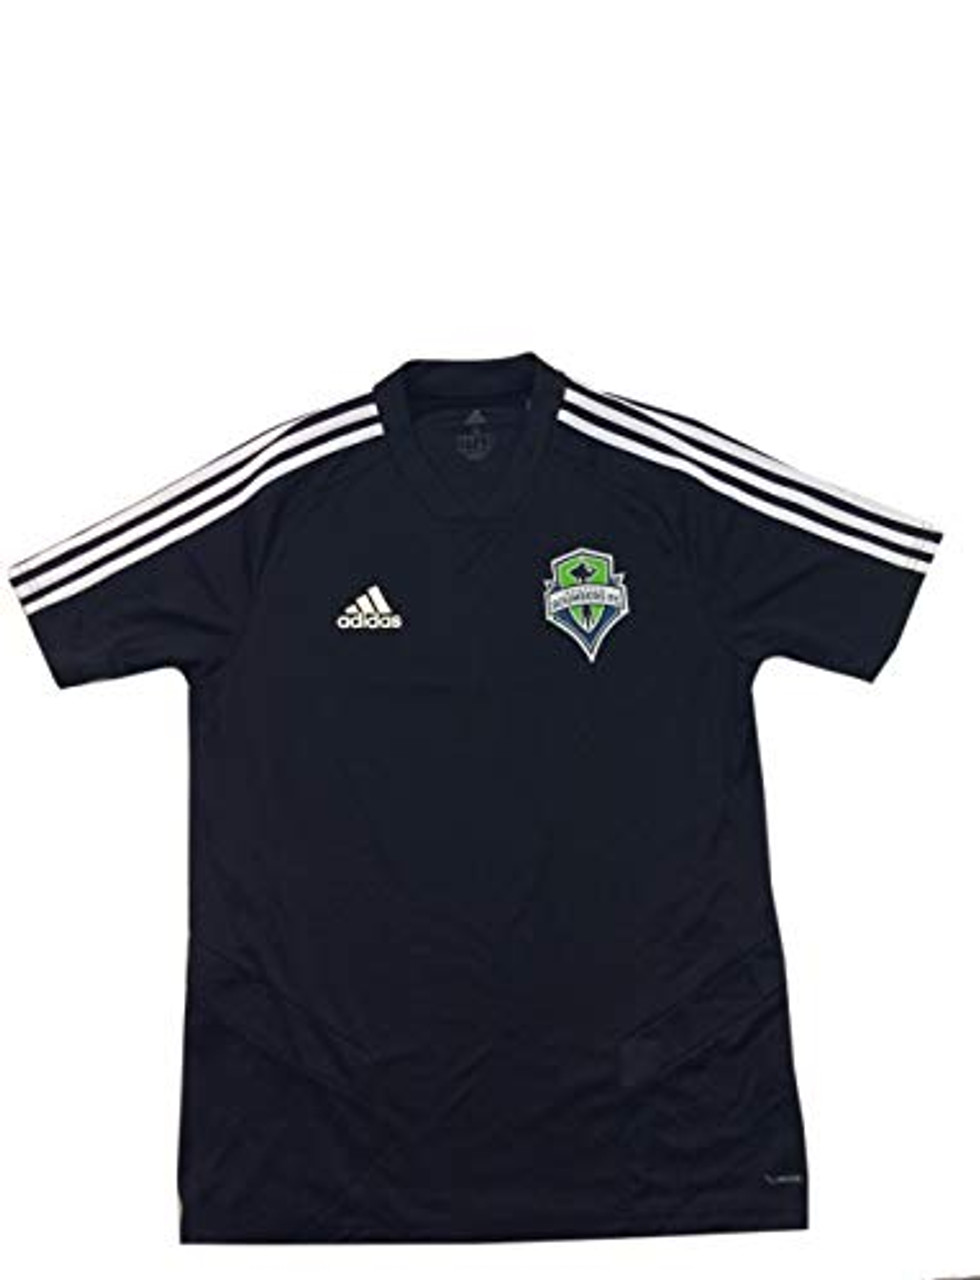 buy popular 7b834 c4271 Adidas Seattle Sounders FC Jersey